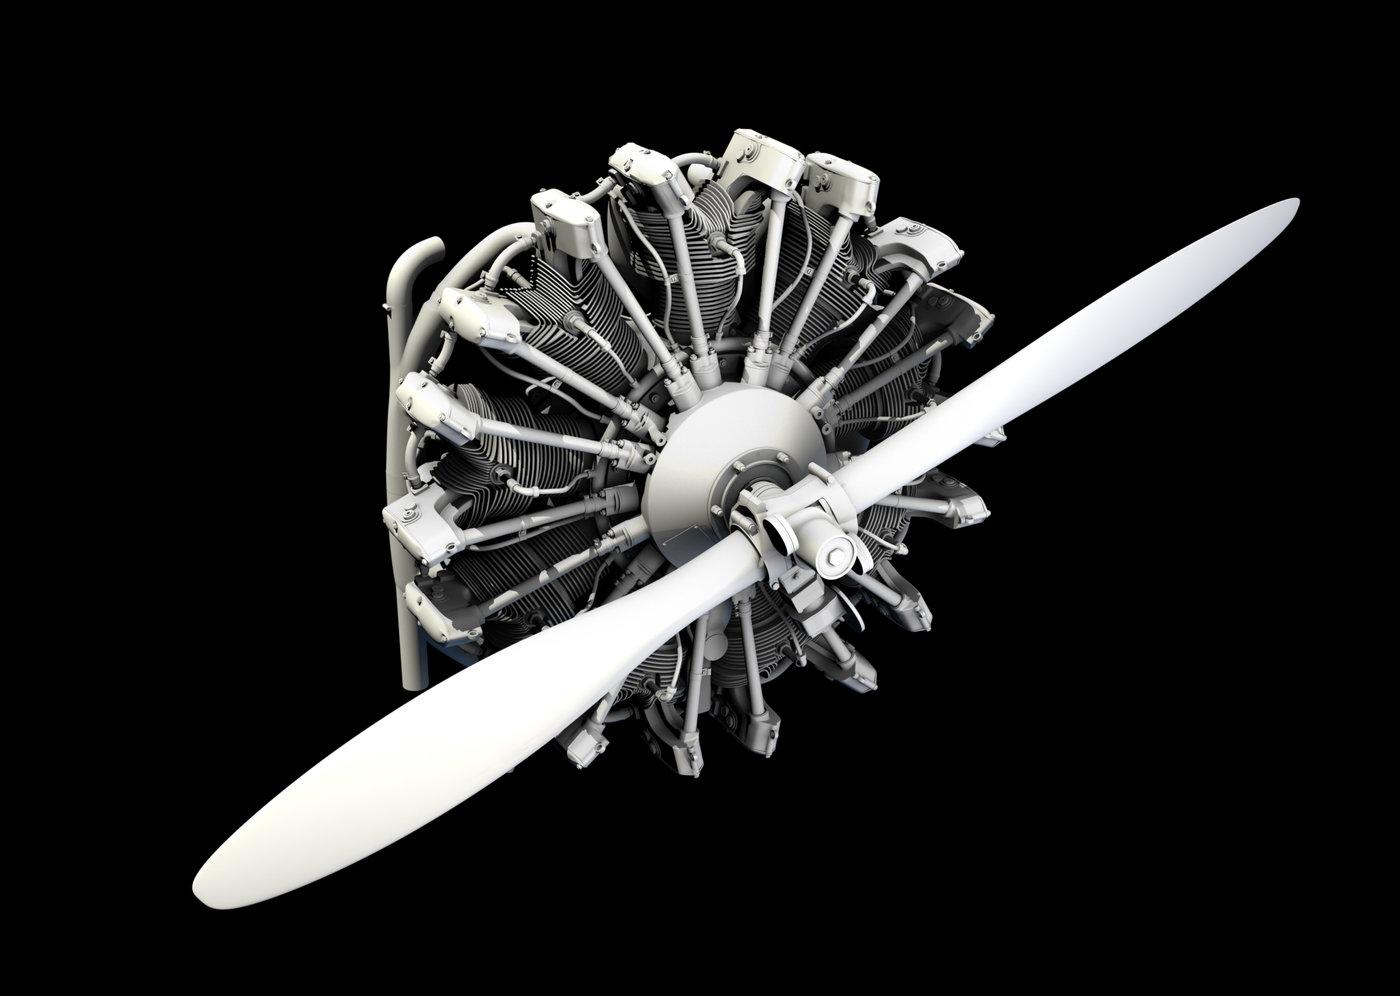 lycoming s first radial engine by charles floyd at coroflot com rh coroflot com